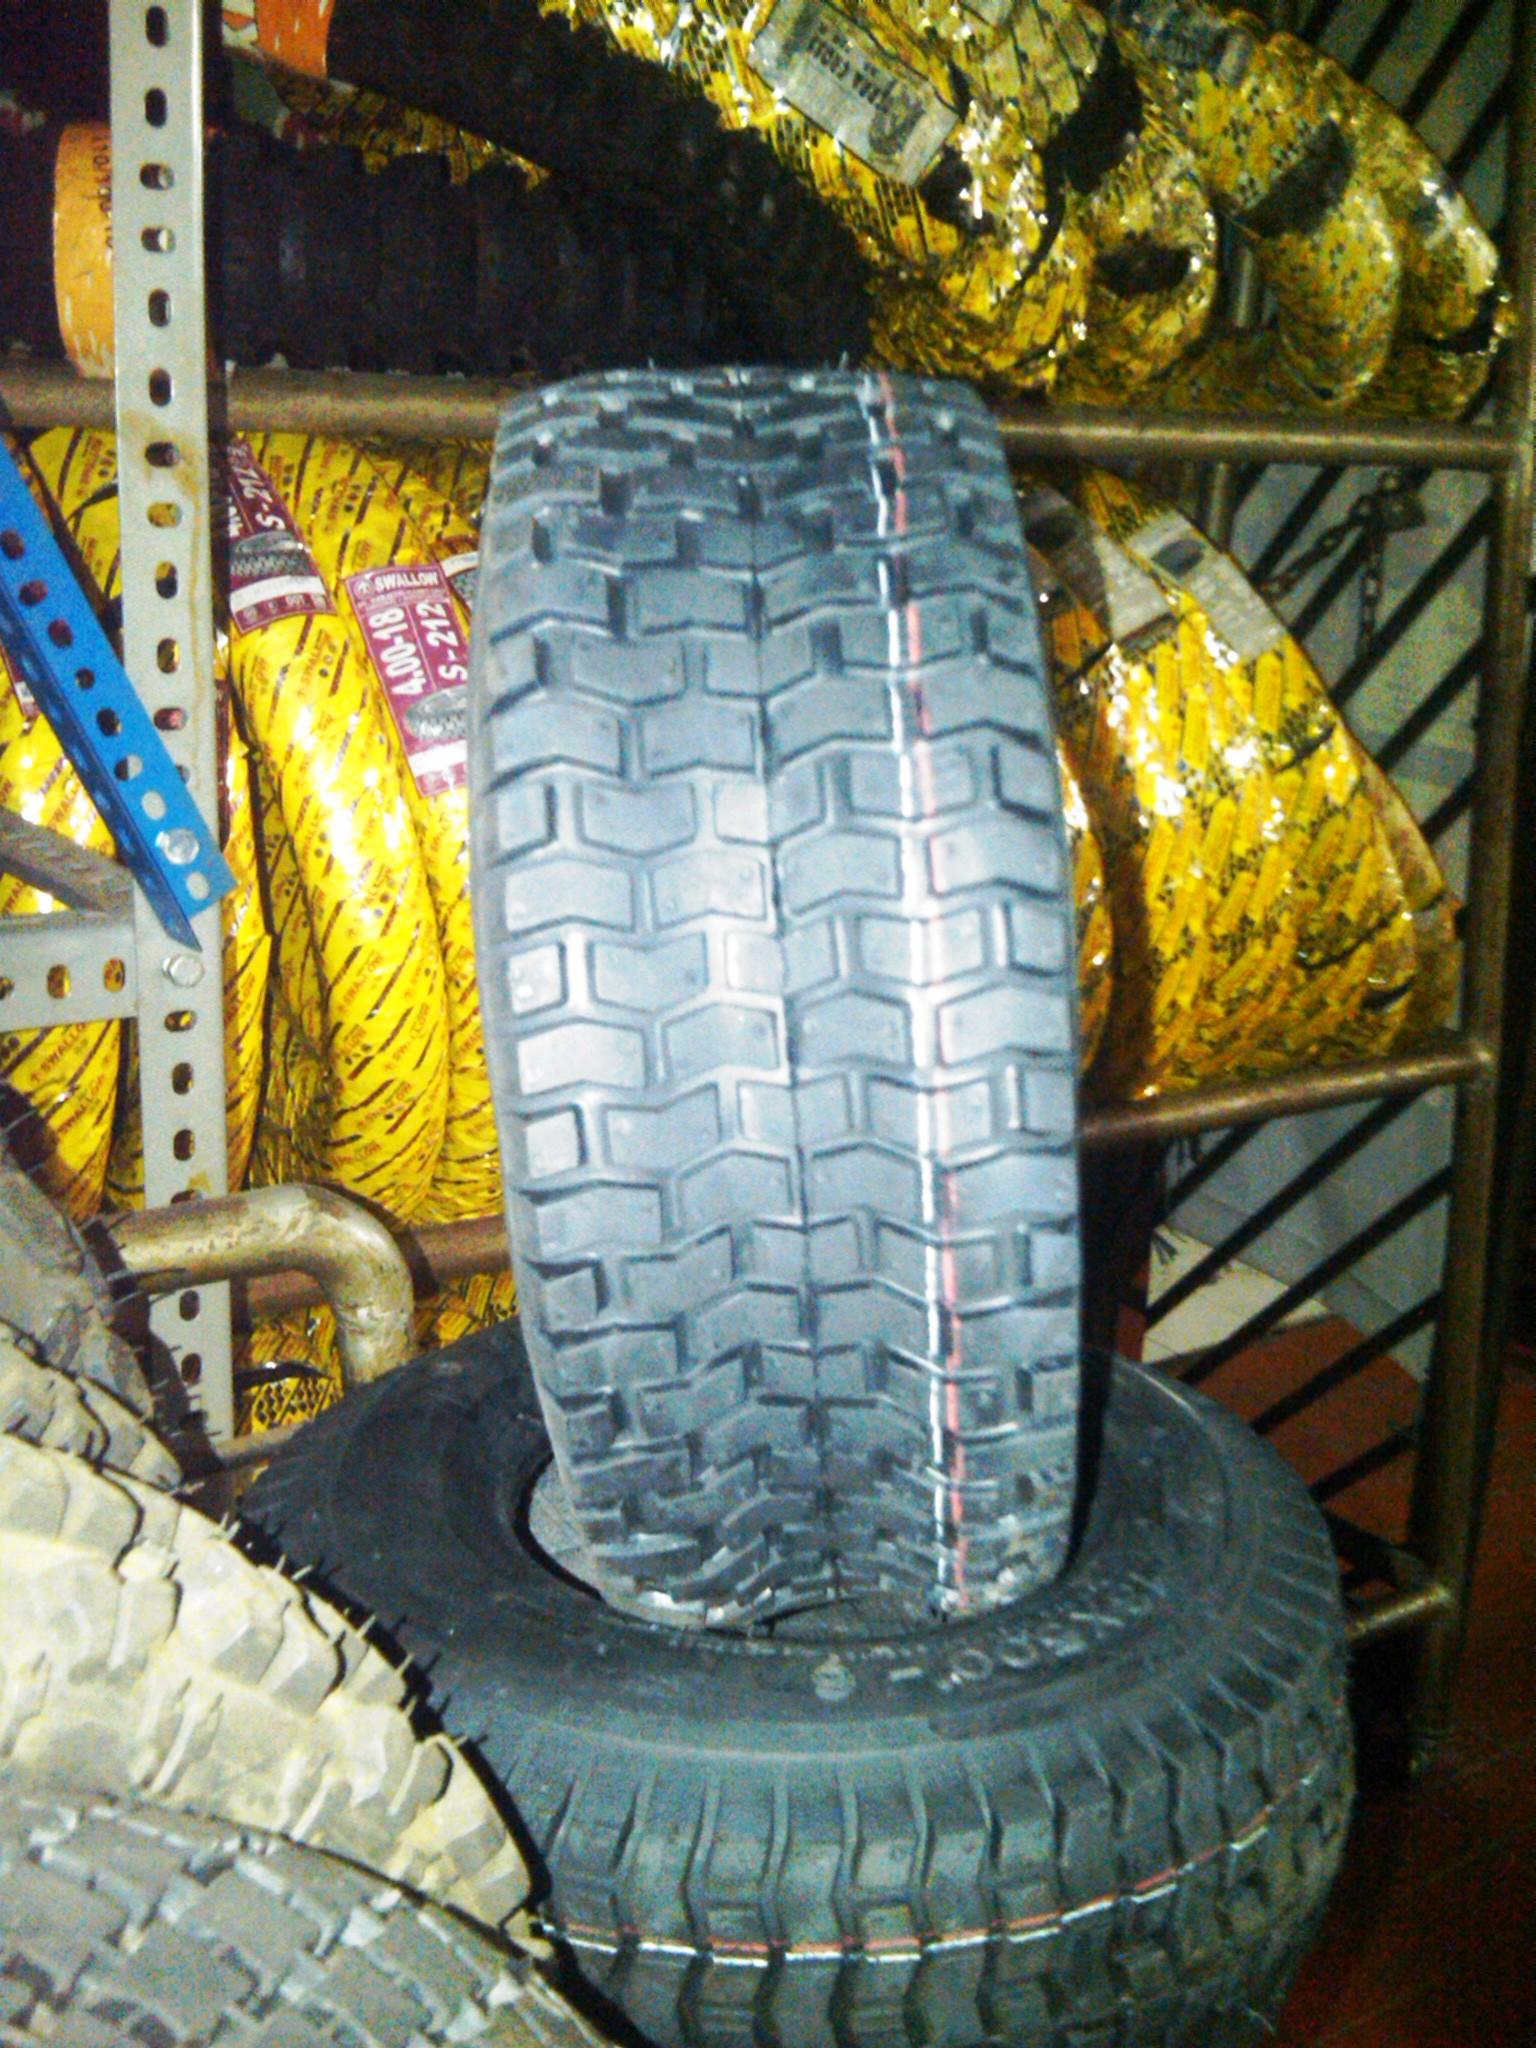 Jual BAN ATV 110cc Ring 6 Ukuran 13 X 500 6 Merk DELITIRE